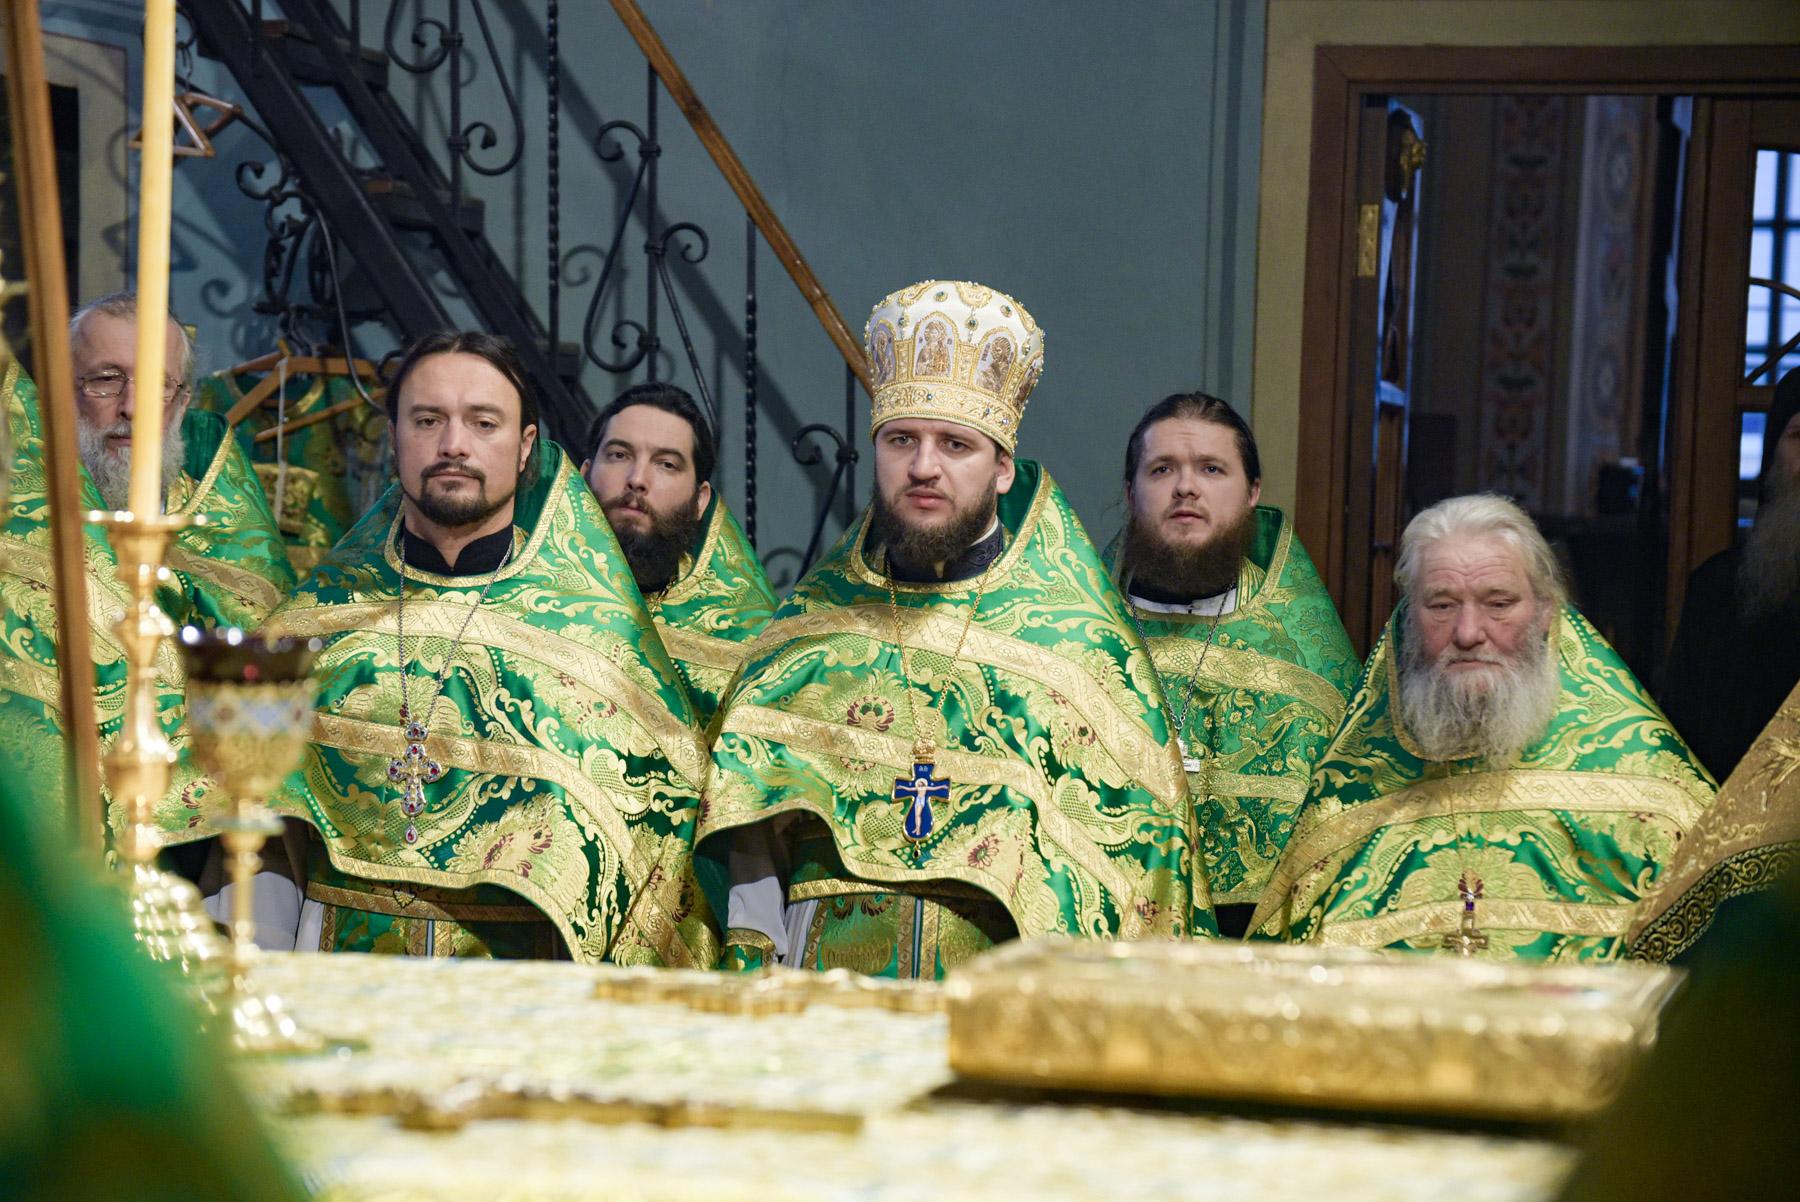 photos of orthodox christmas 0109 2